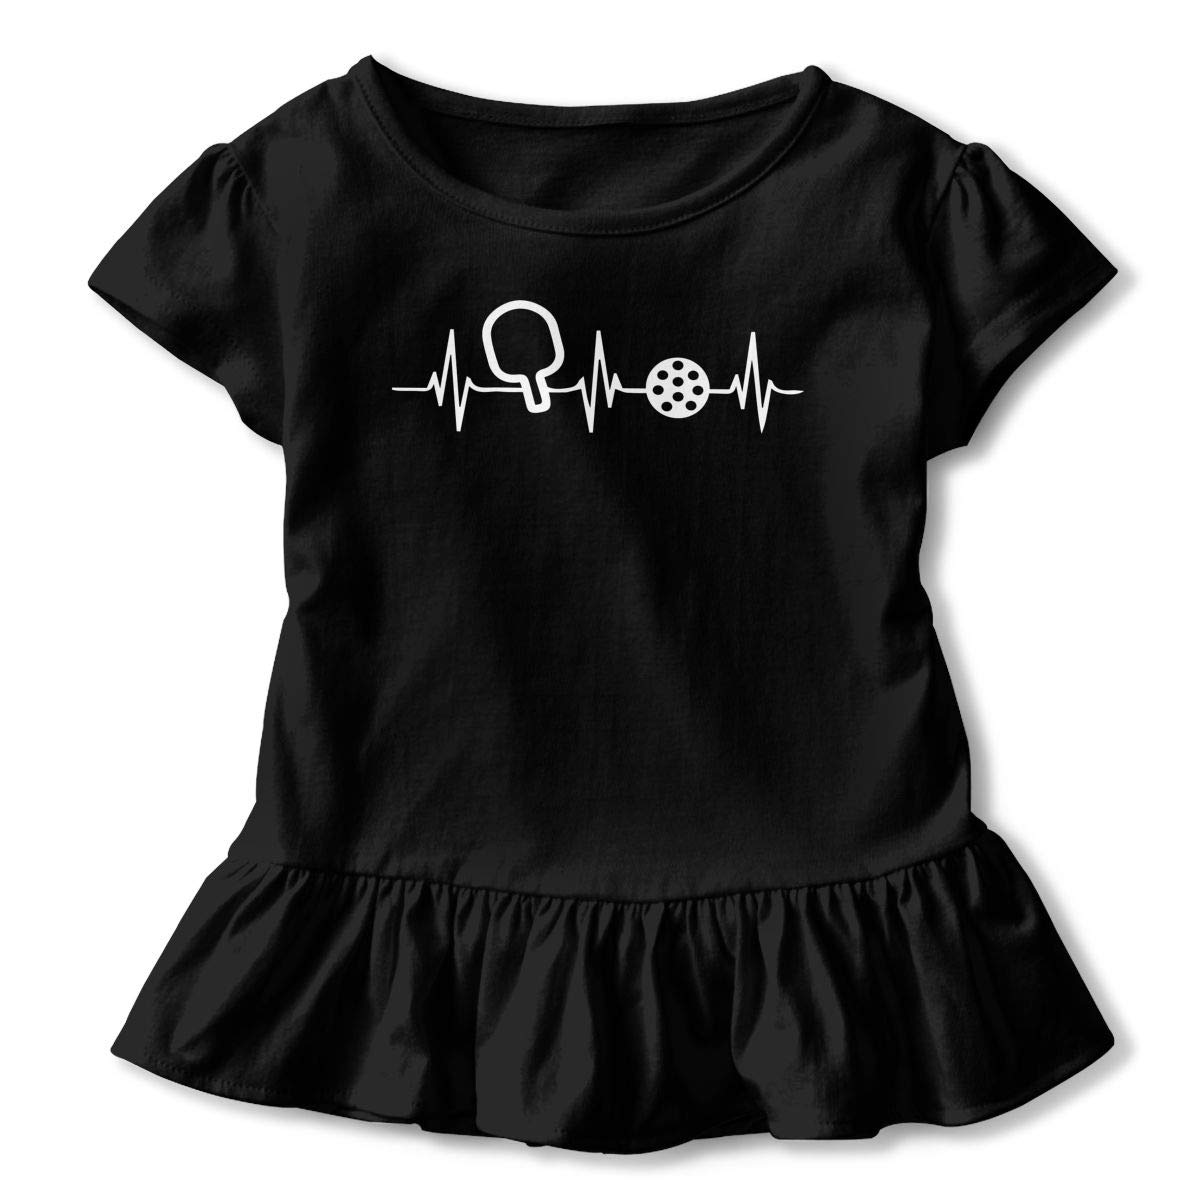 Pickleball Heartbeat Baby Girls Short Sleeve Ruffle Tee Cotton Kids T Shirts 2-6 Years